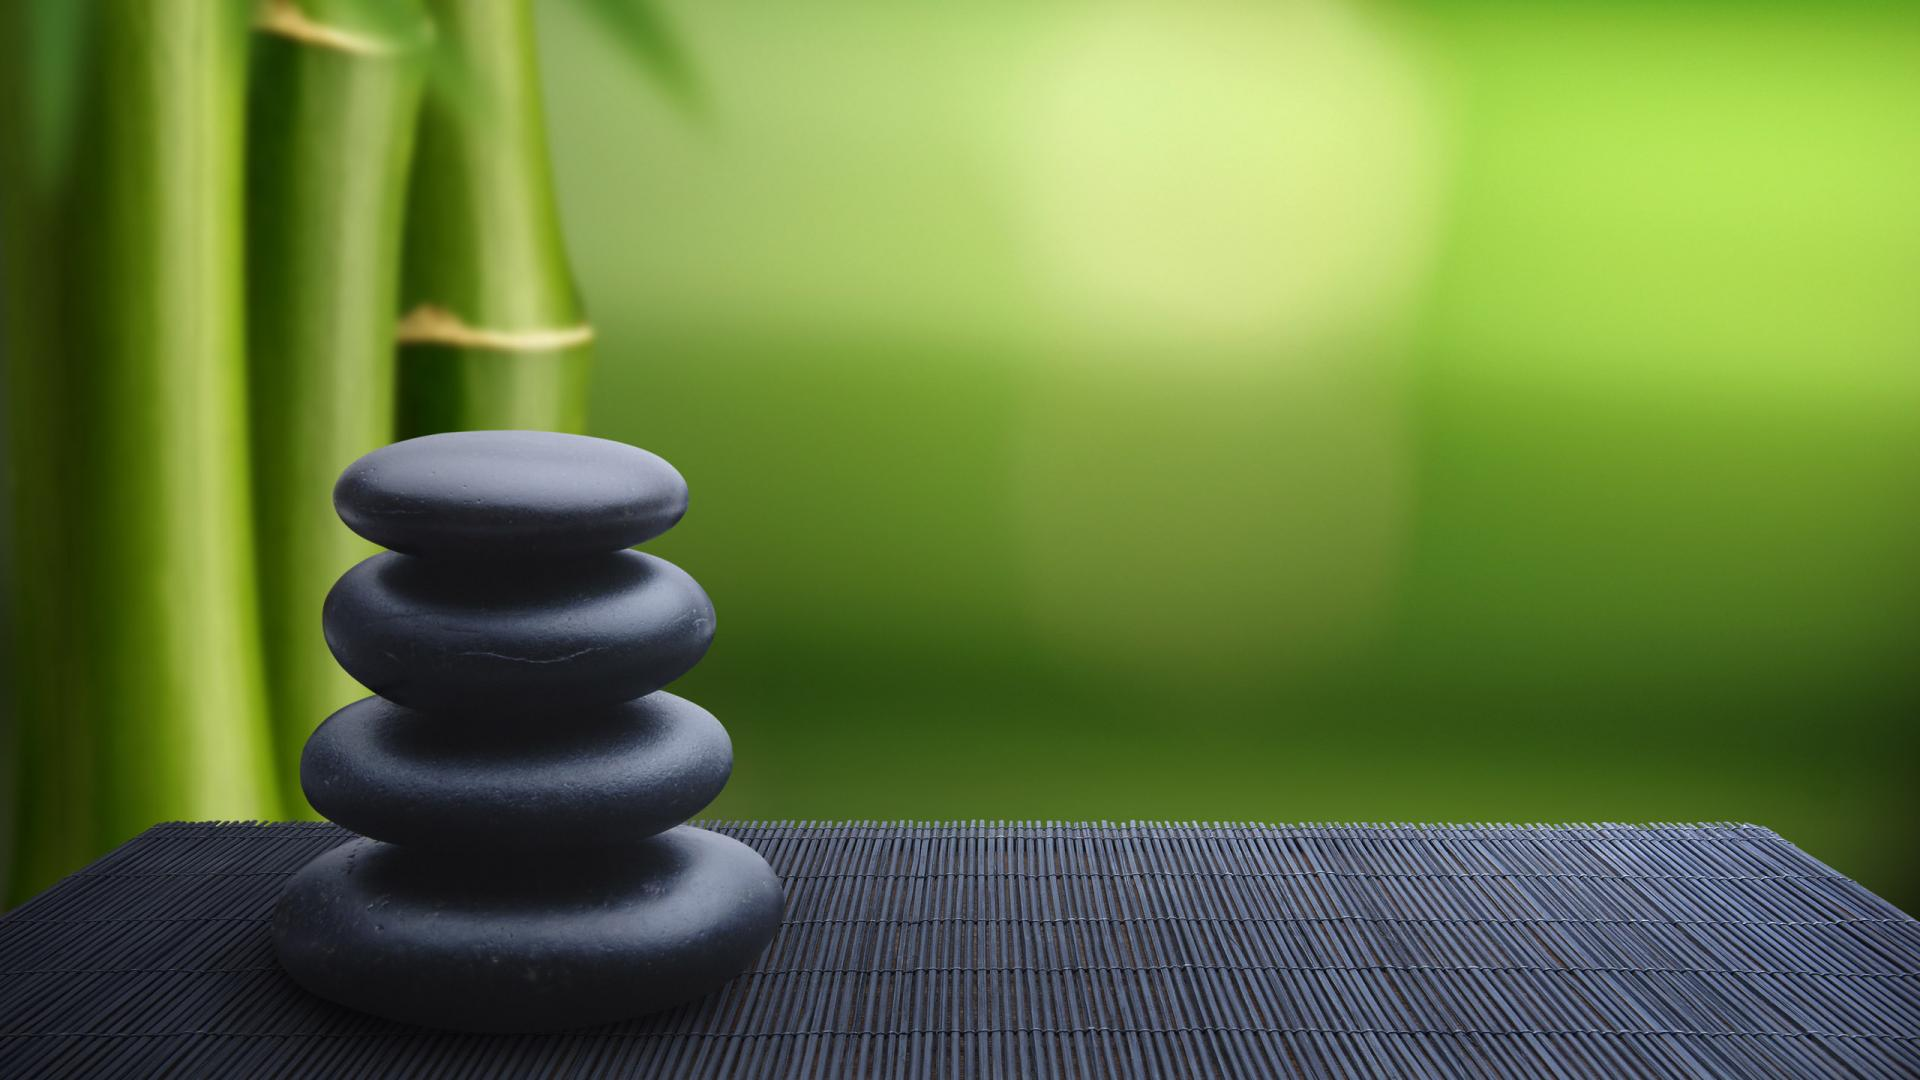 Zen Wallpaper – Best background For Bored Computer Users